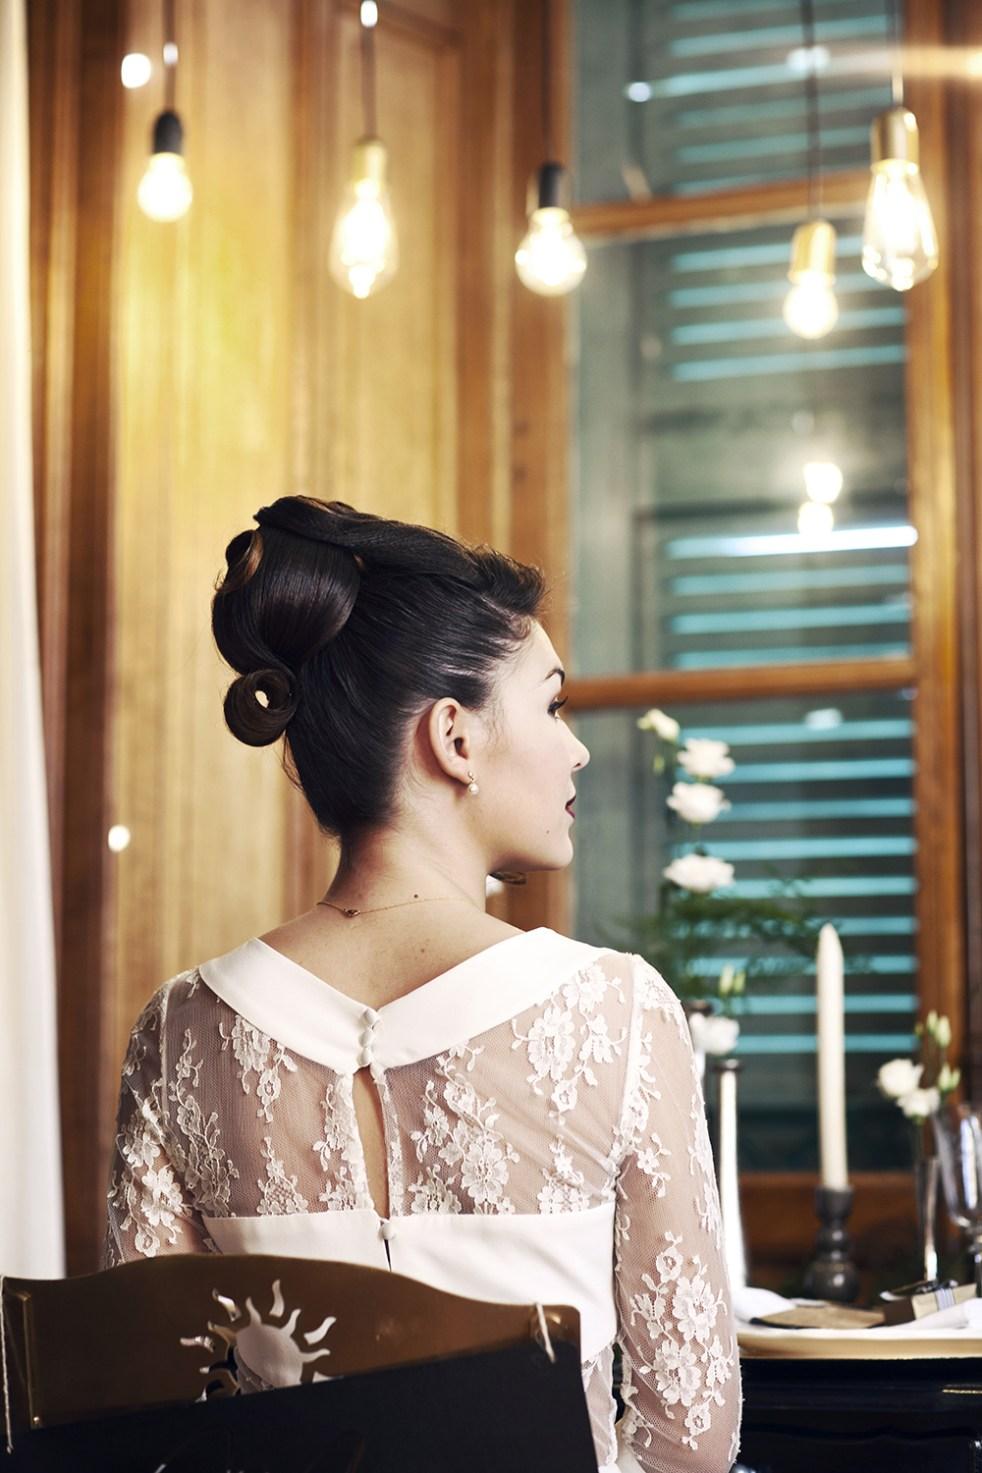 Shooting inspiration Urban Nature tendance mariage chic industriel 2016 © Raphael Keita Photographe | Blog La Mariée Sous Les Etoiles